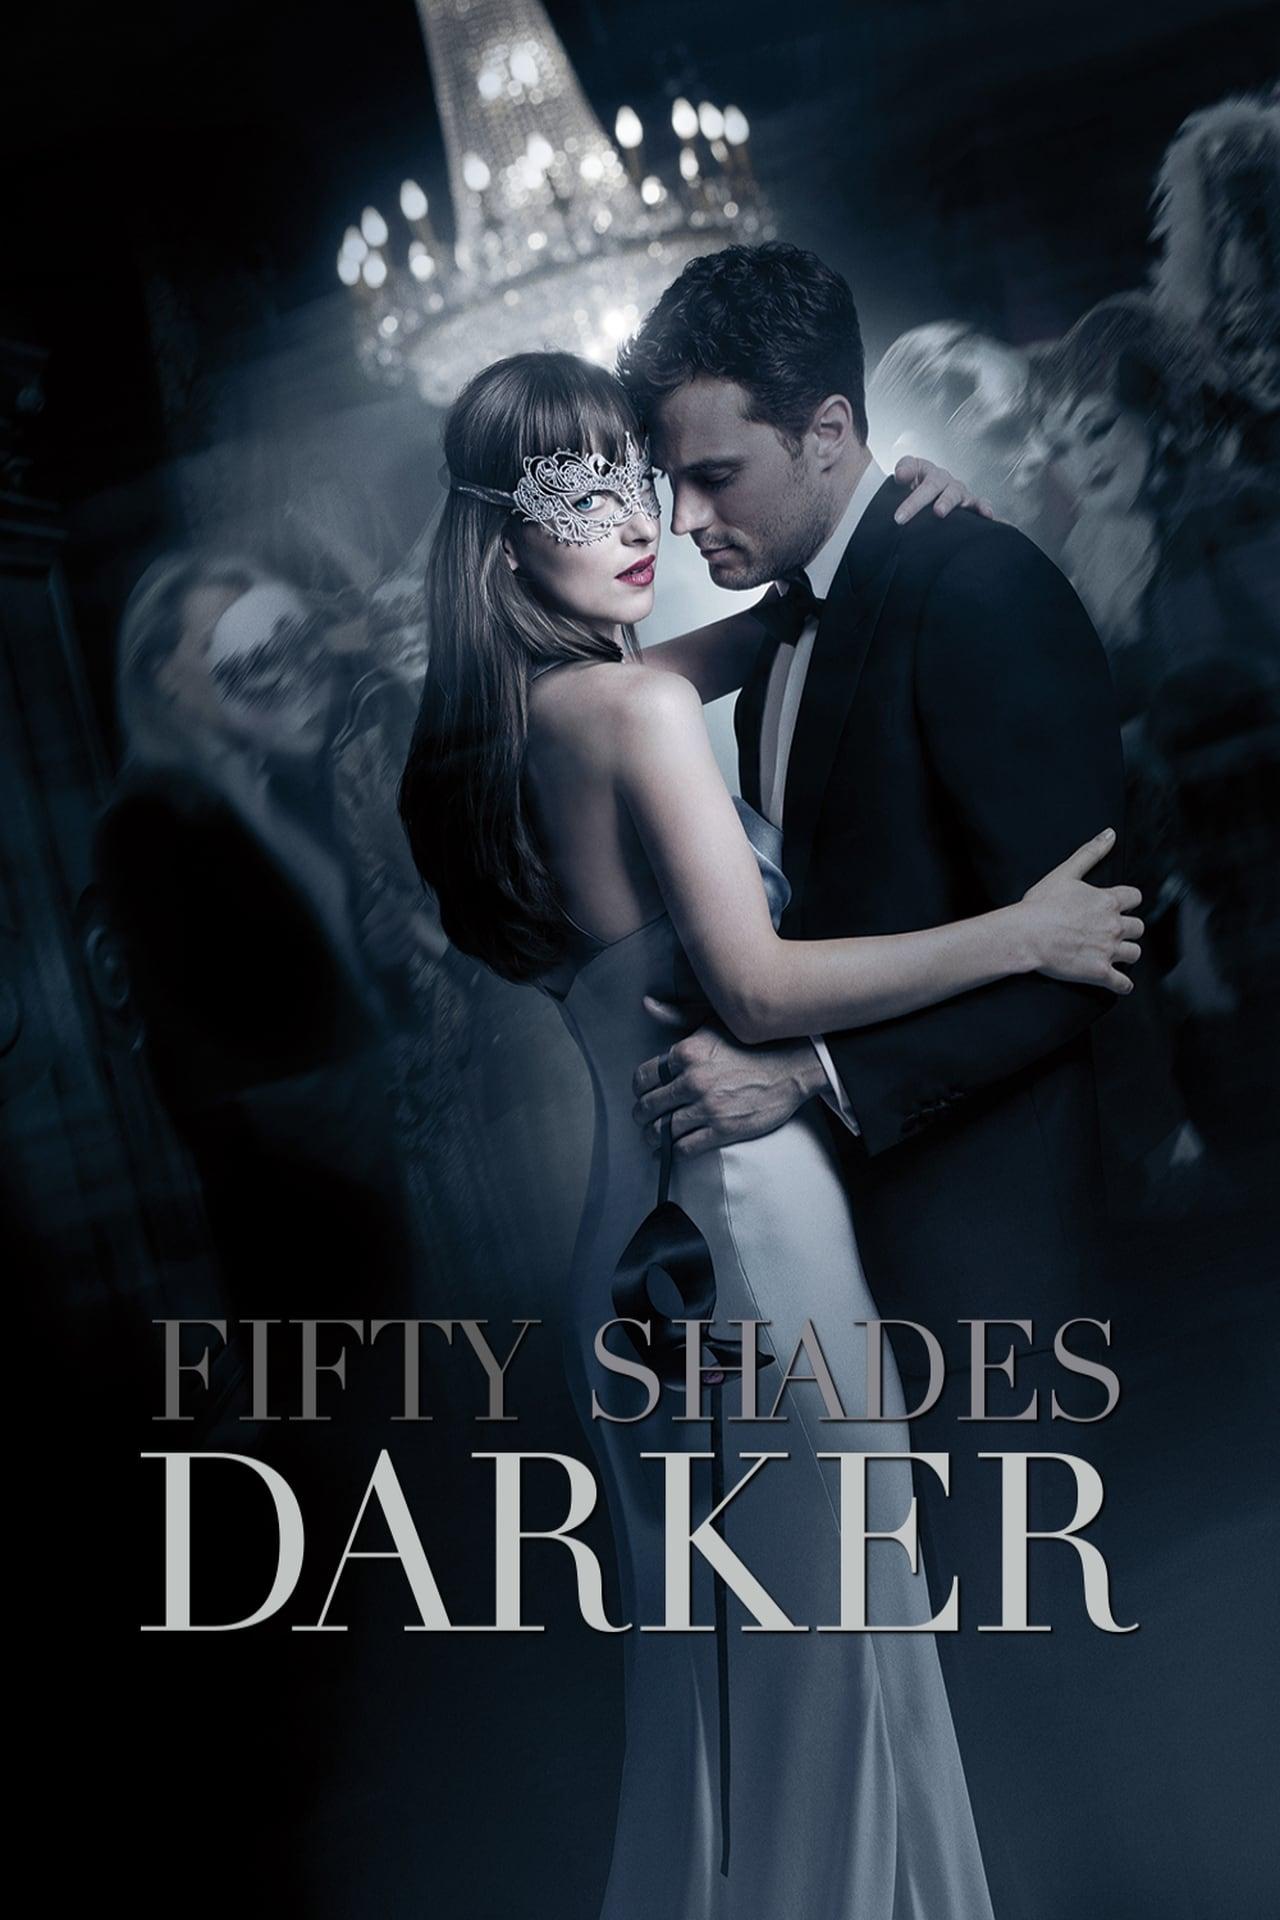 Watch Free Fifty Shades Darker (2017) Movies Trailer at